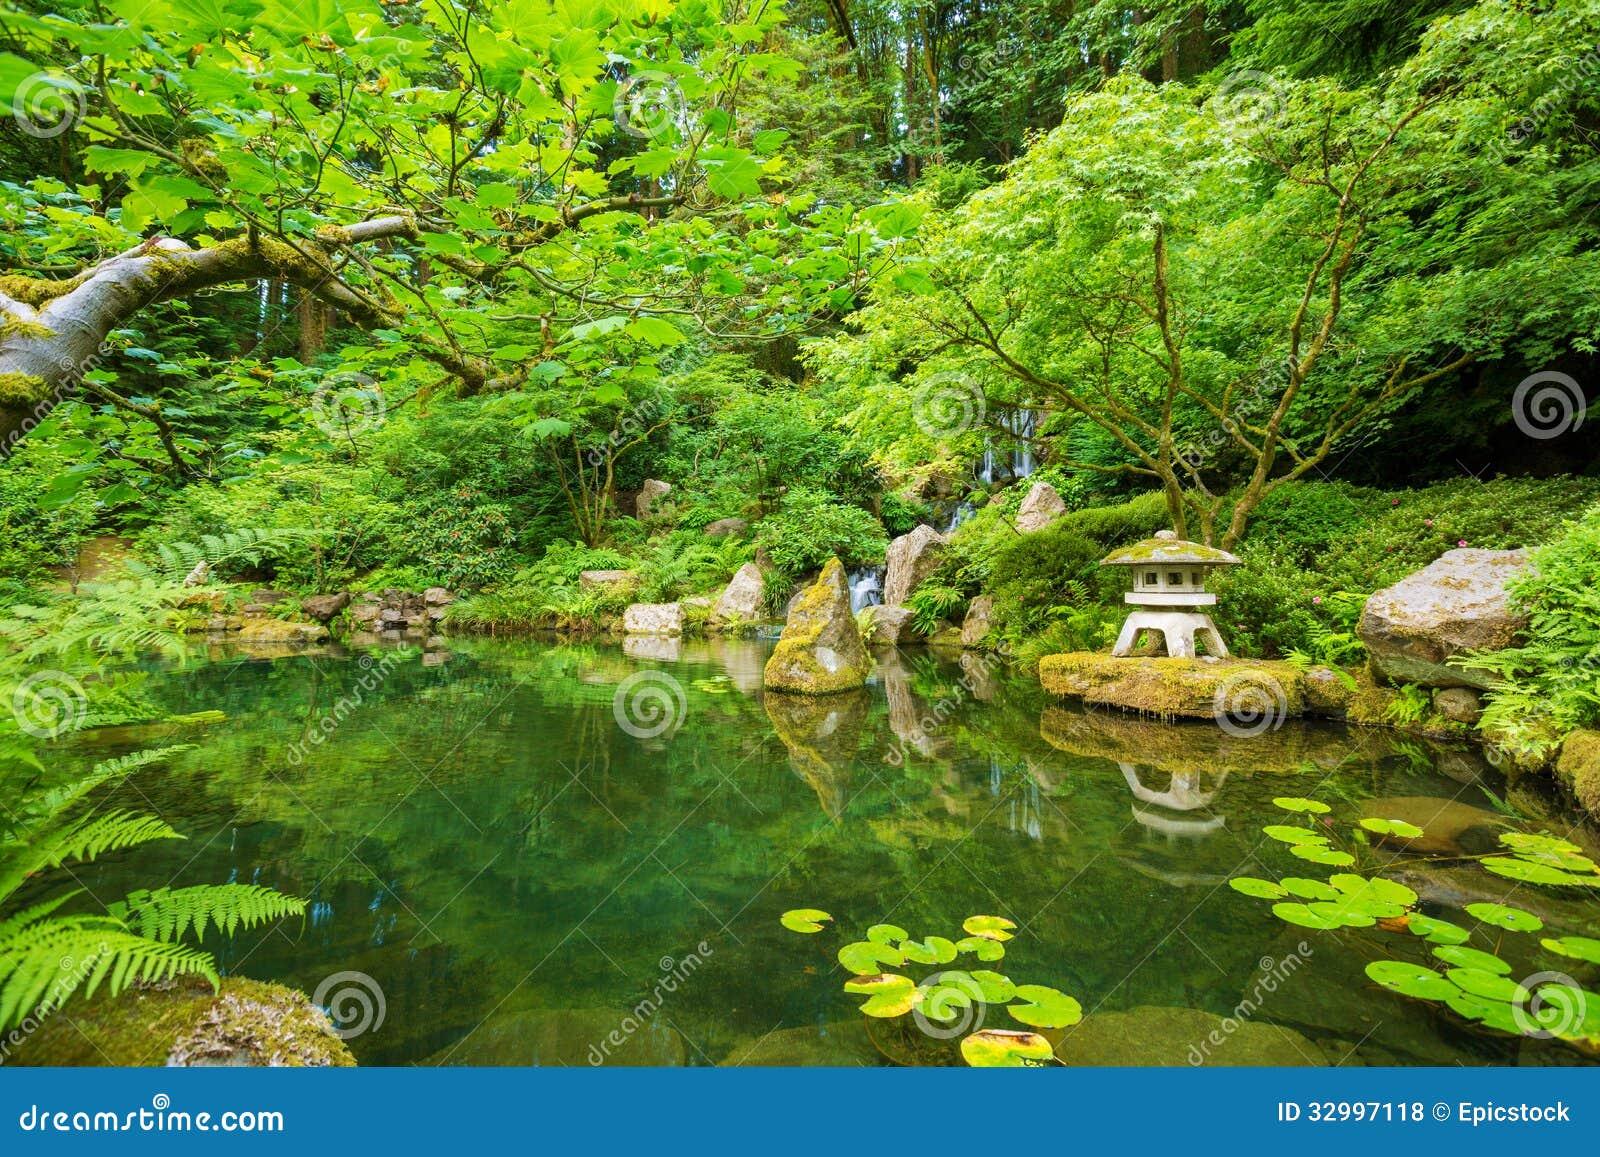 Beautiful Japanese Garden Stock Photo Image Of Bridge 32997118